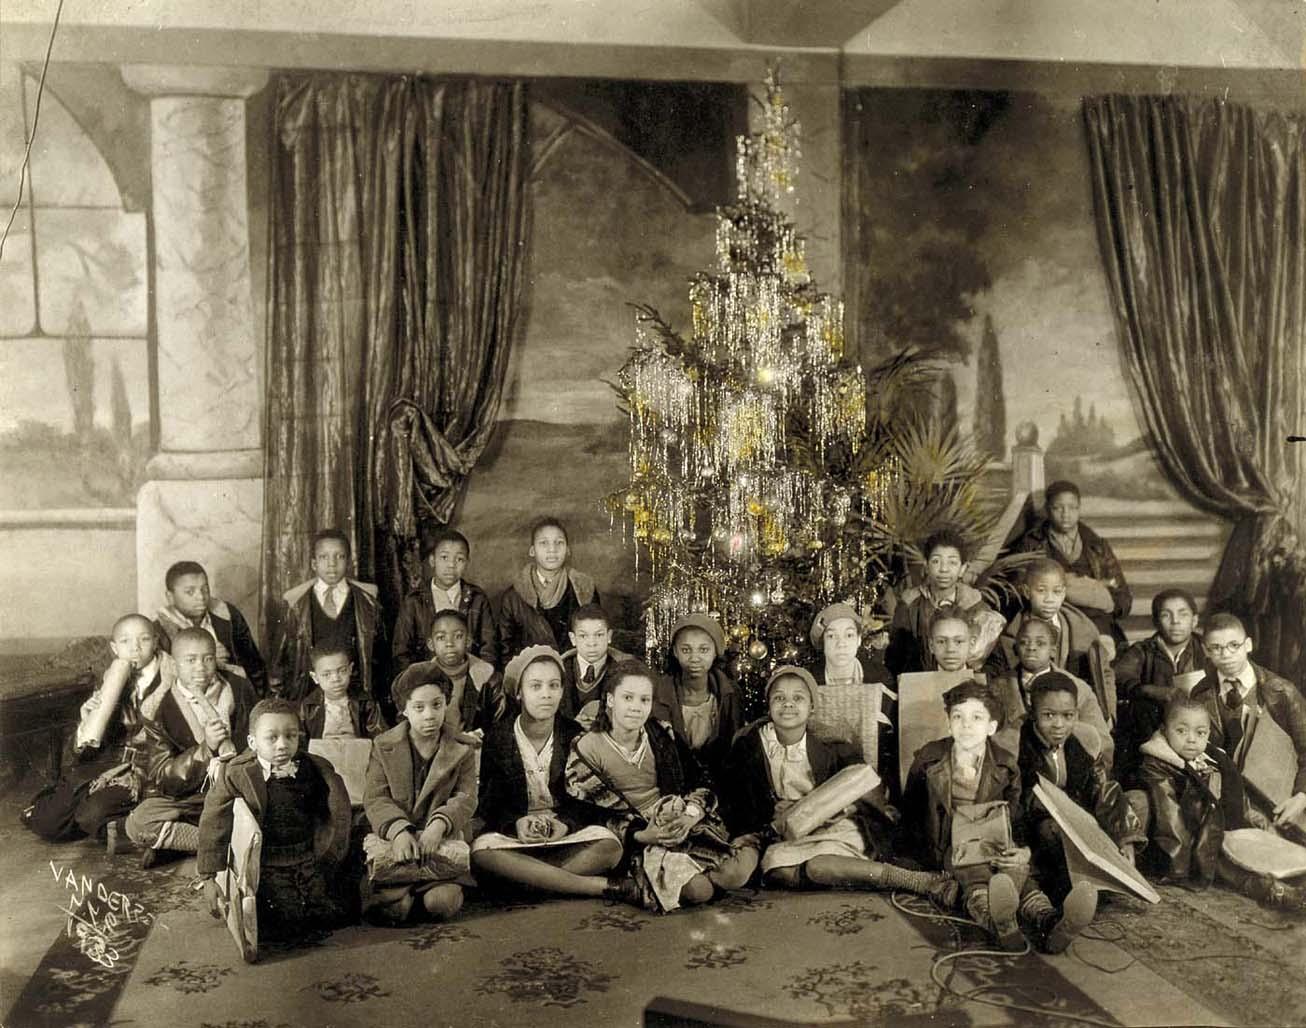 VanDerZee - GGG Photo Studio at Christmas